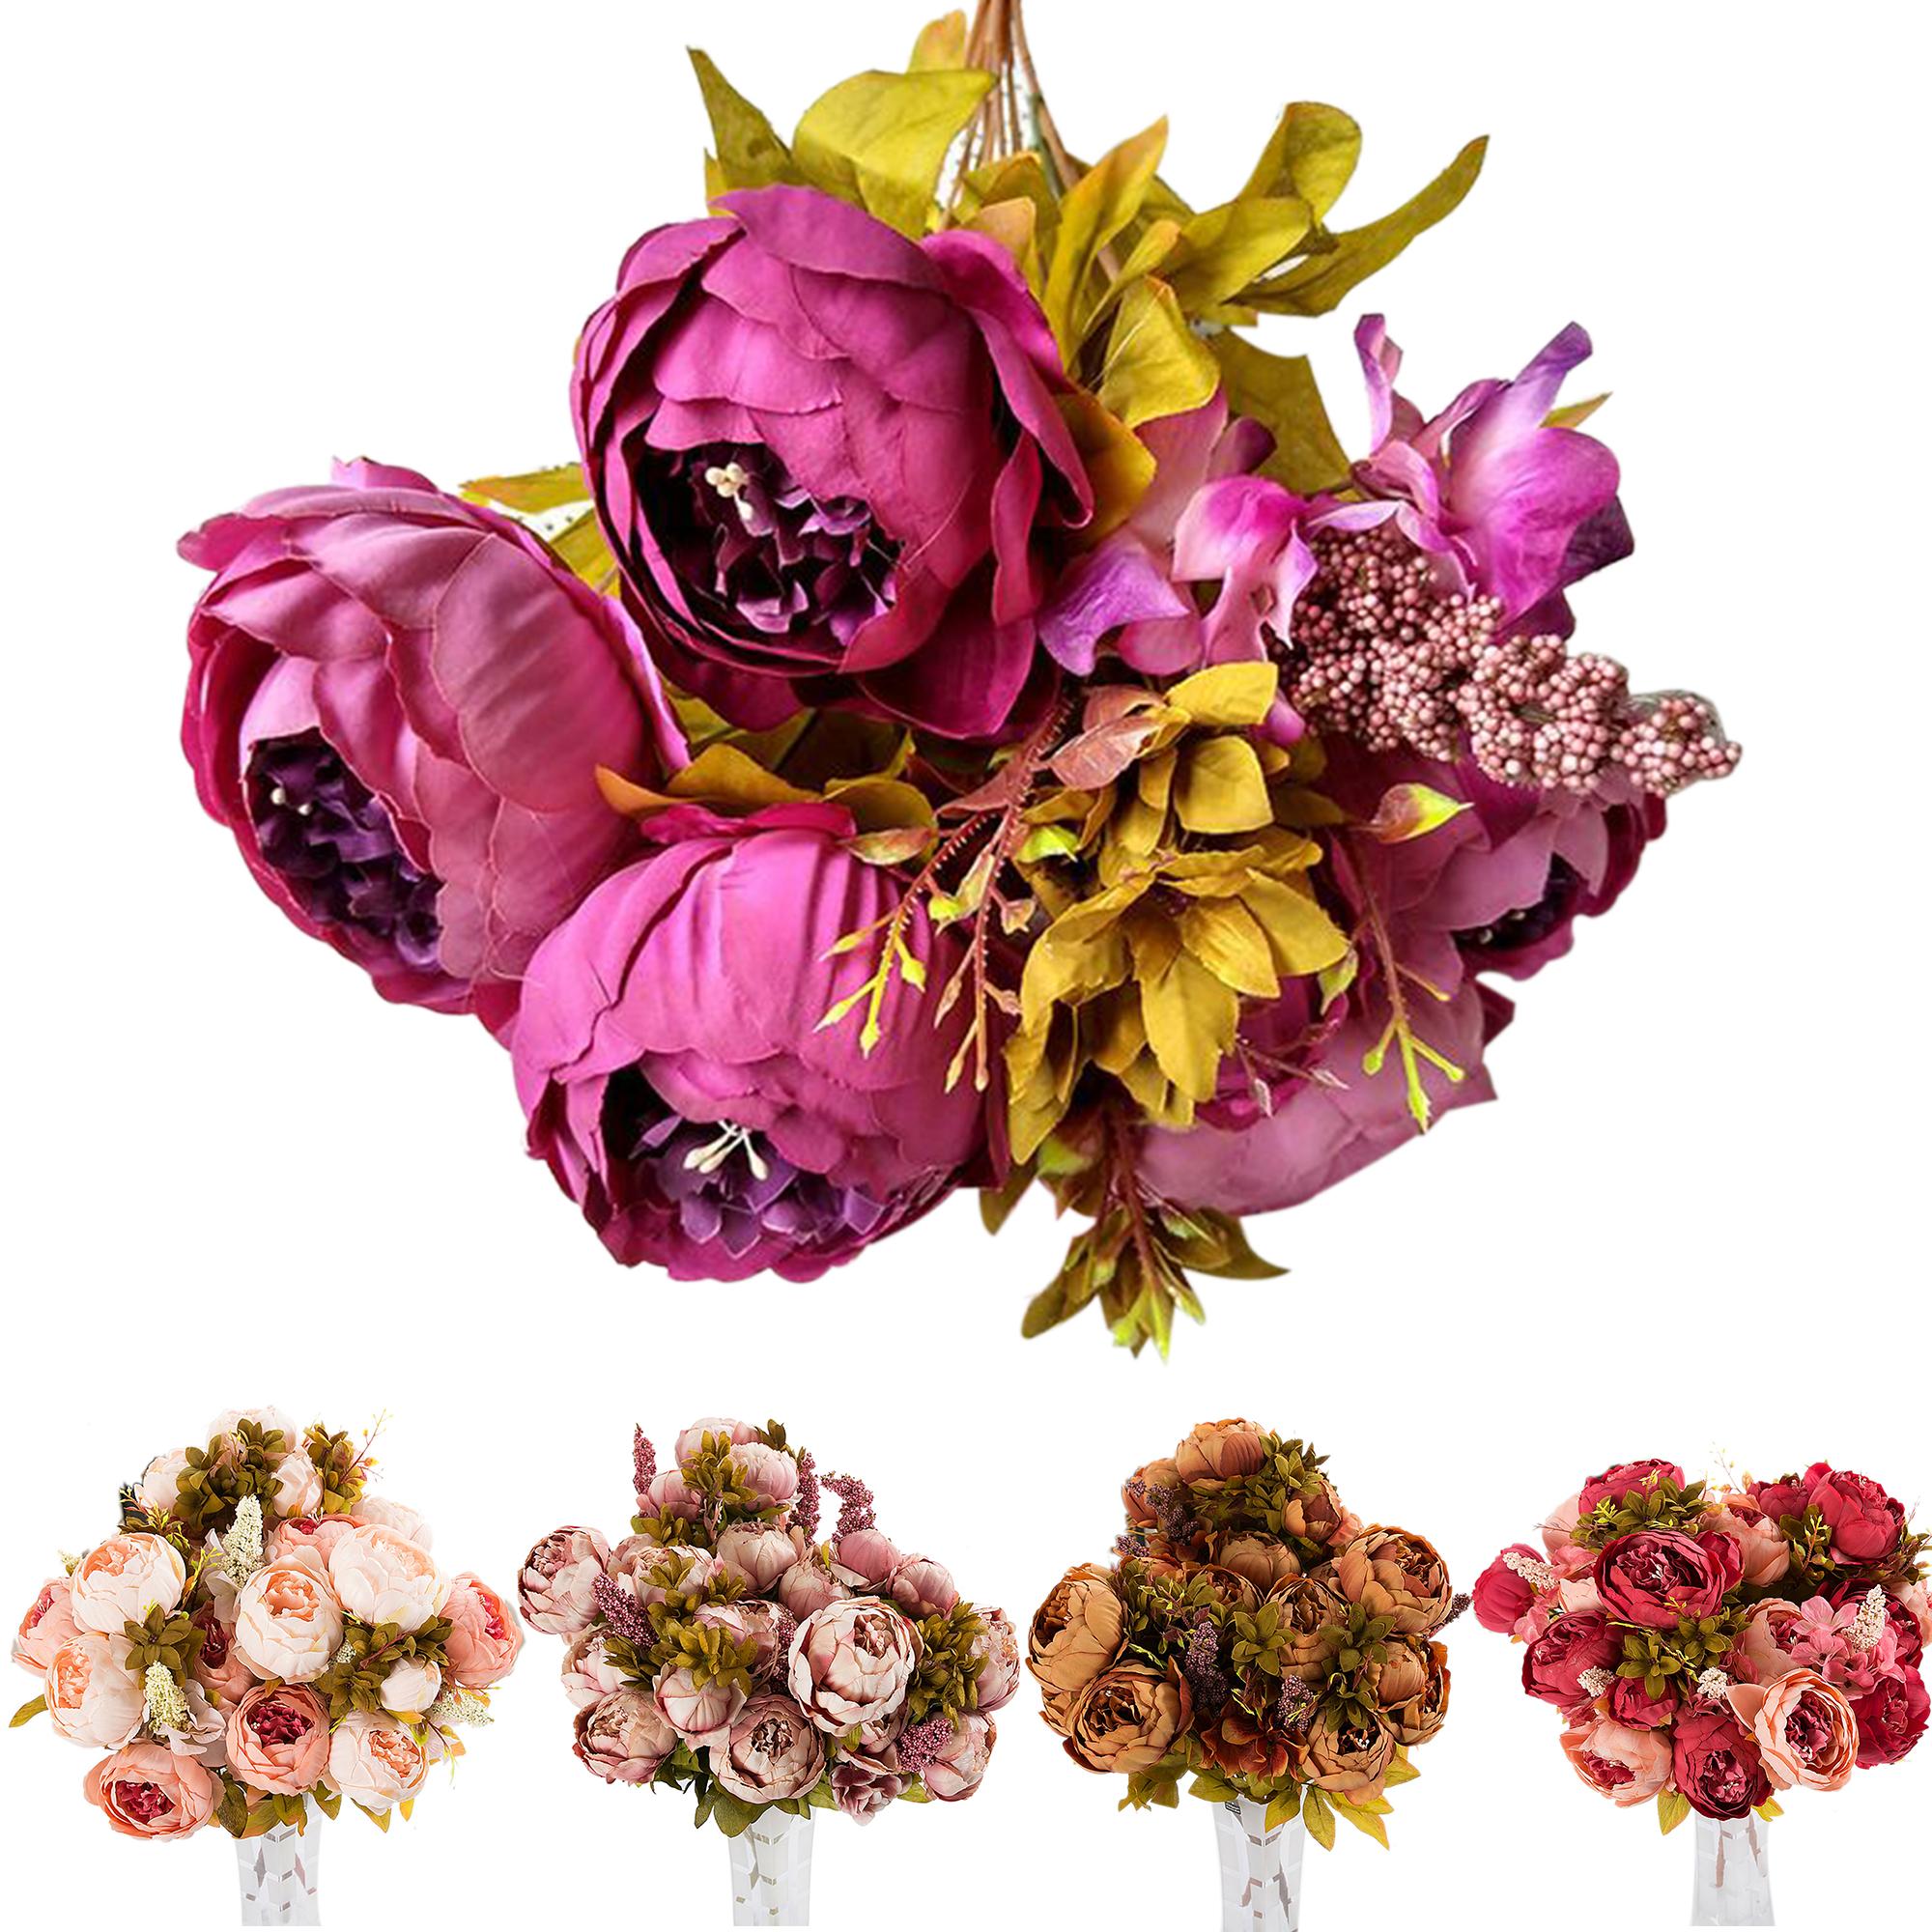 CUH Artificial Peony Arrangement Bouquet European for Bedding Wedding Office Living Room Meeting Room Garden Floral